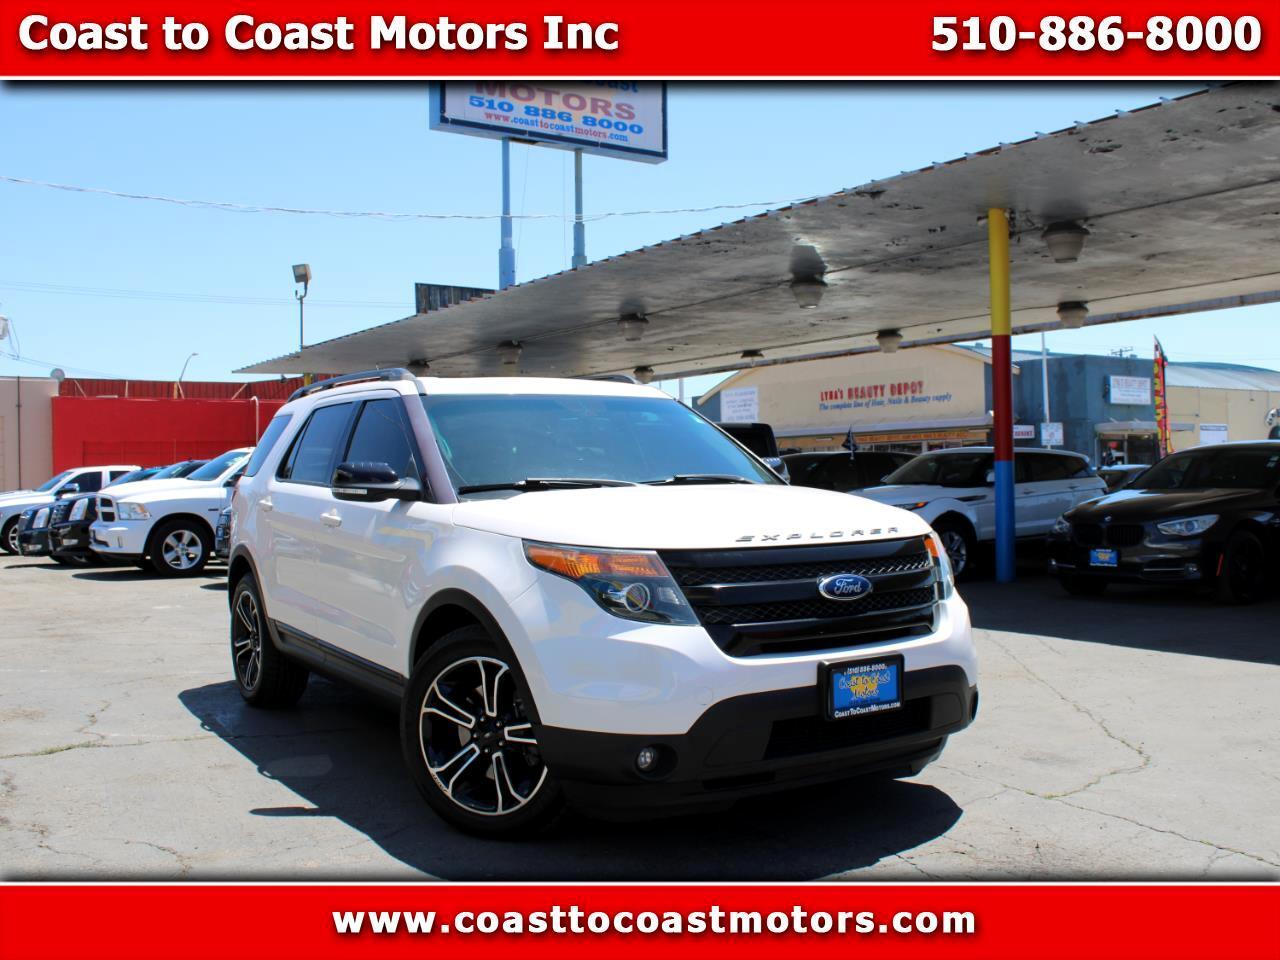 2015 Ford Explorer Hayward CA